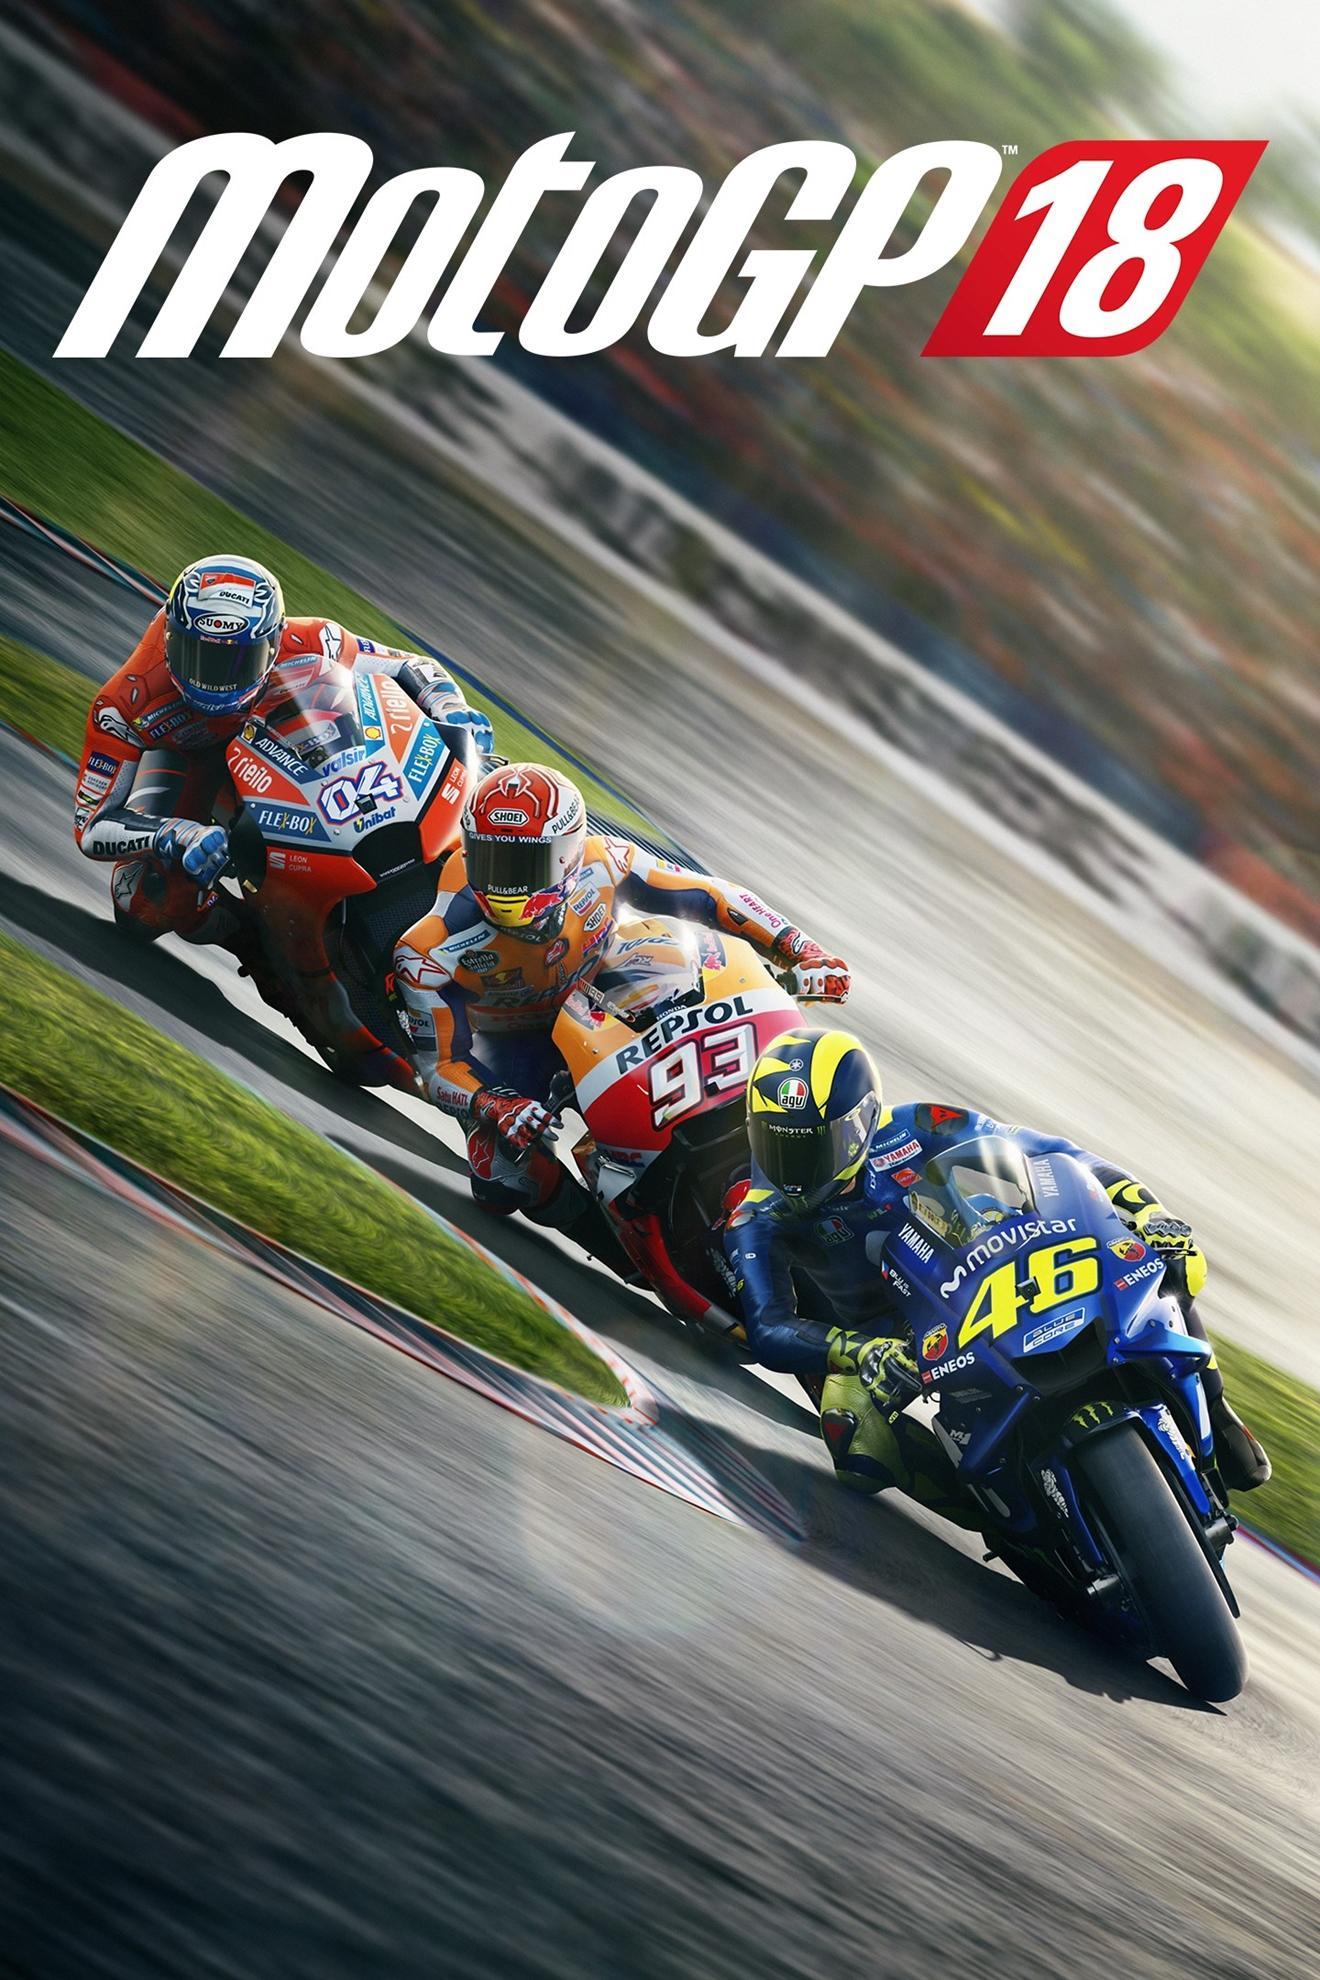 Picture of MotoGP™18